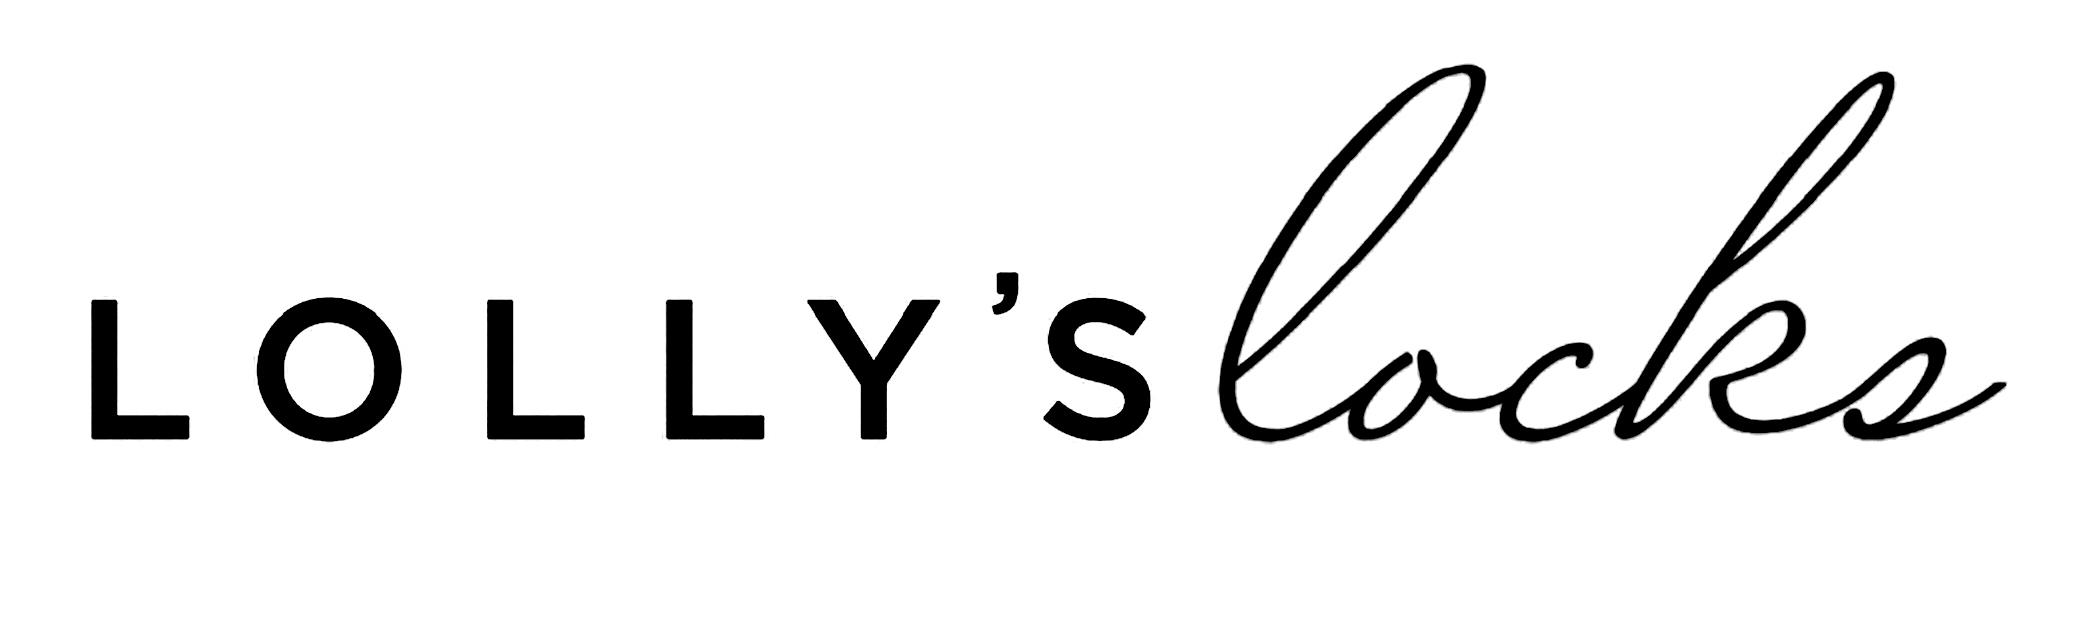 lollys locks logo.jpg